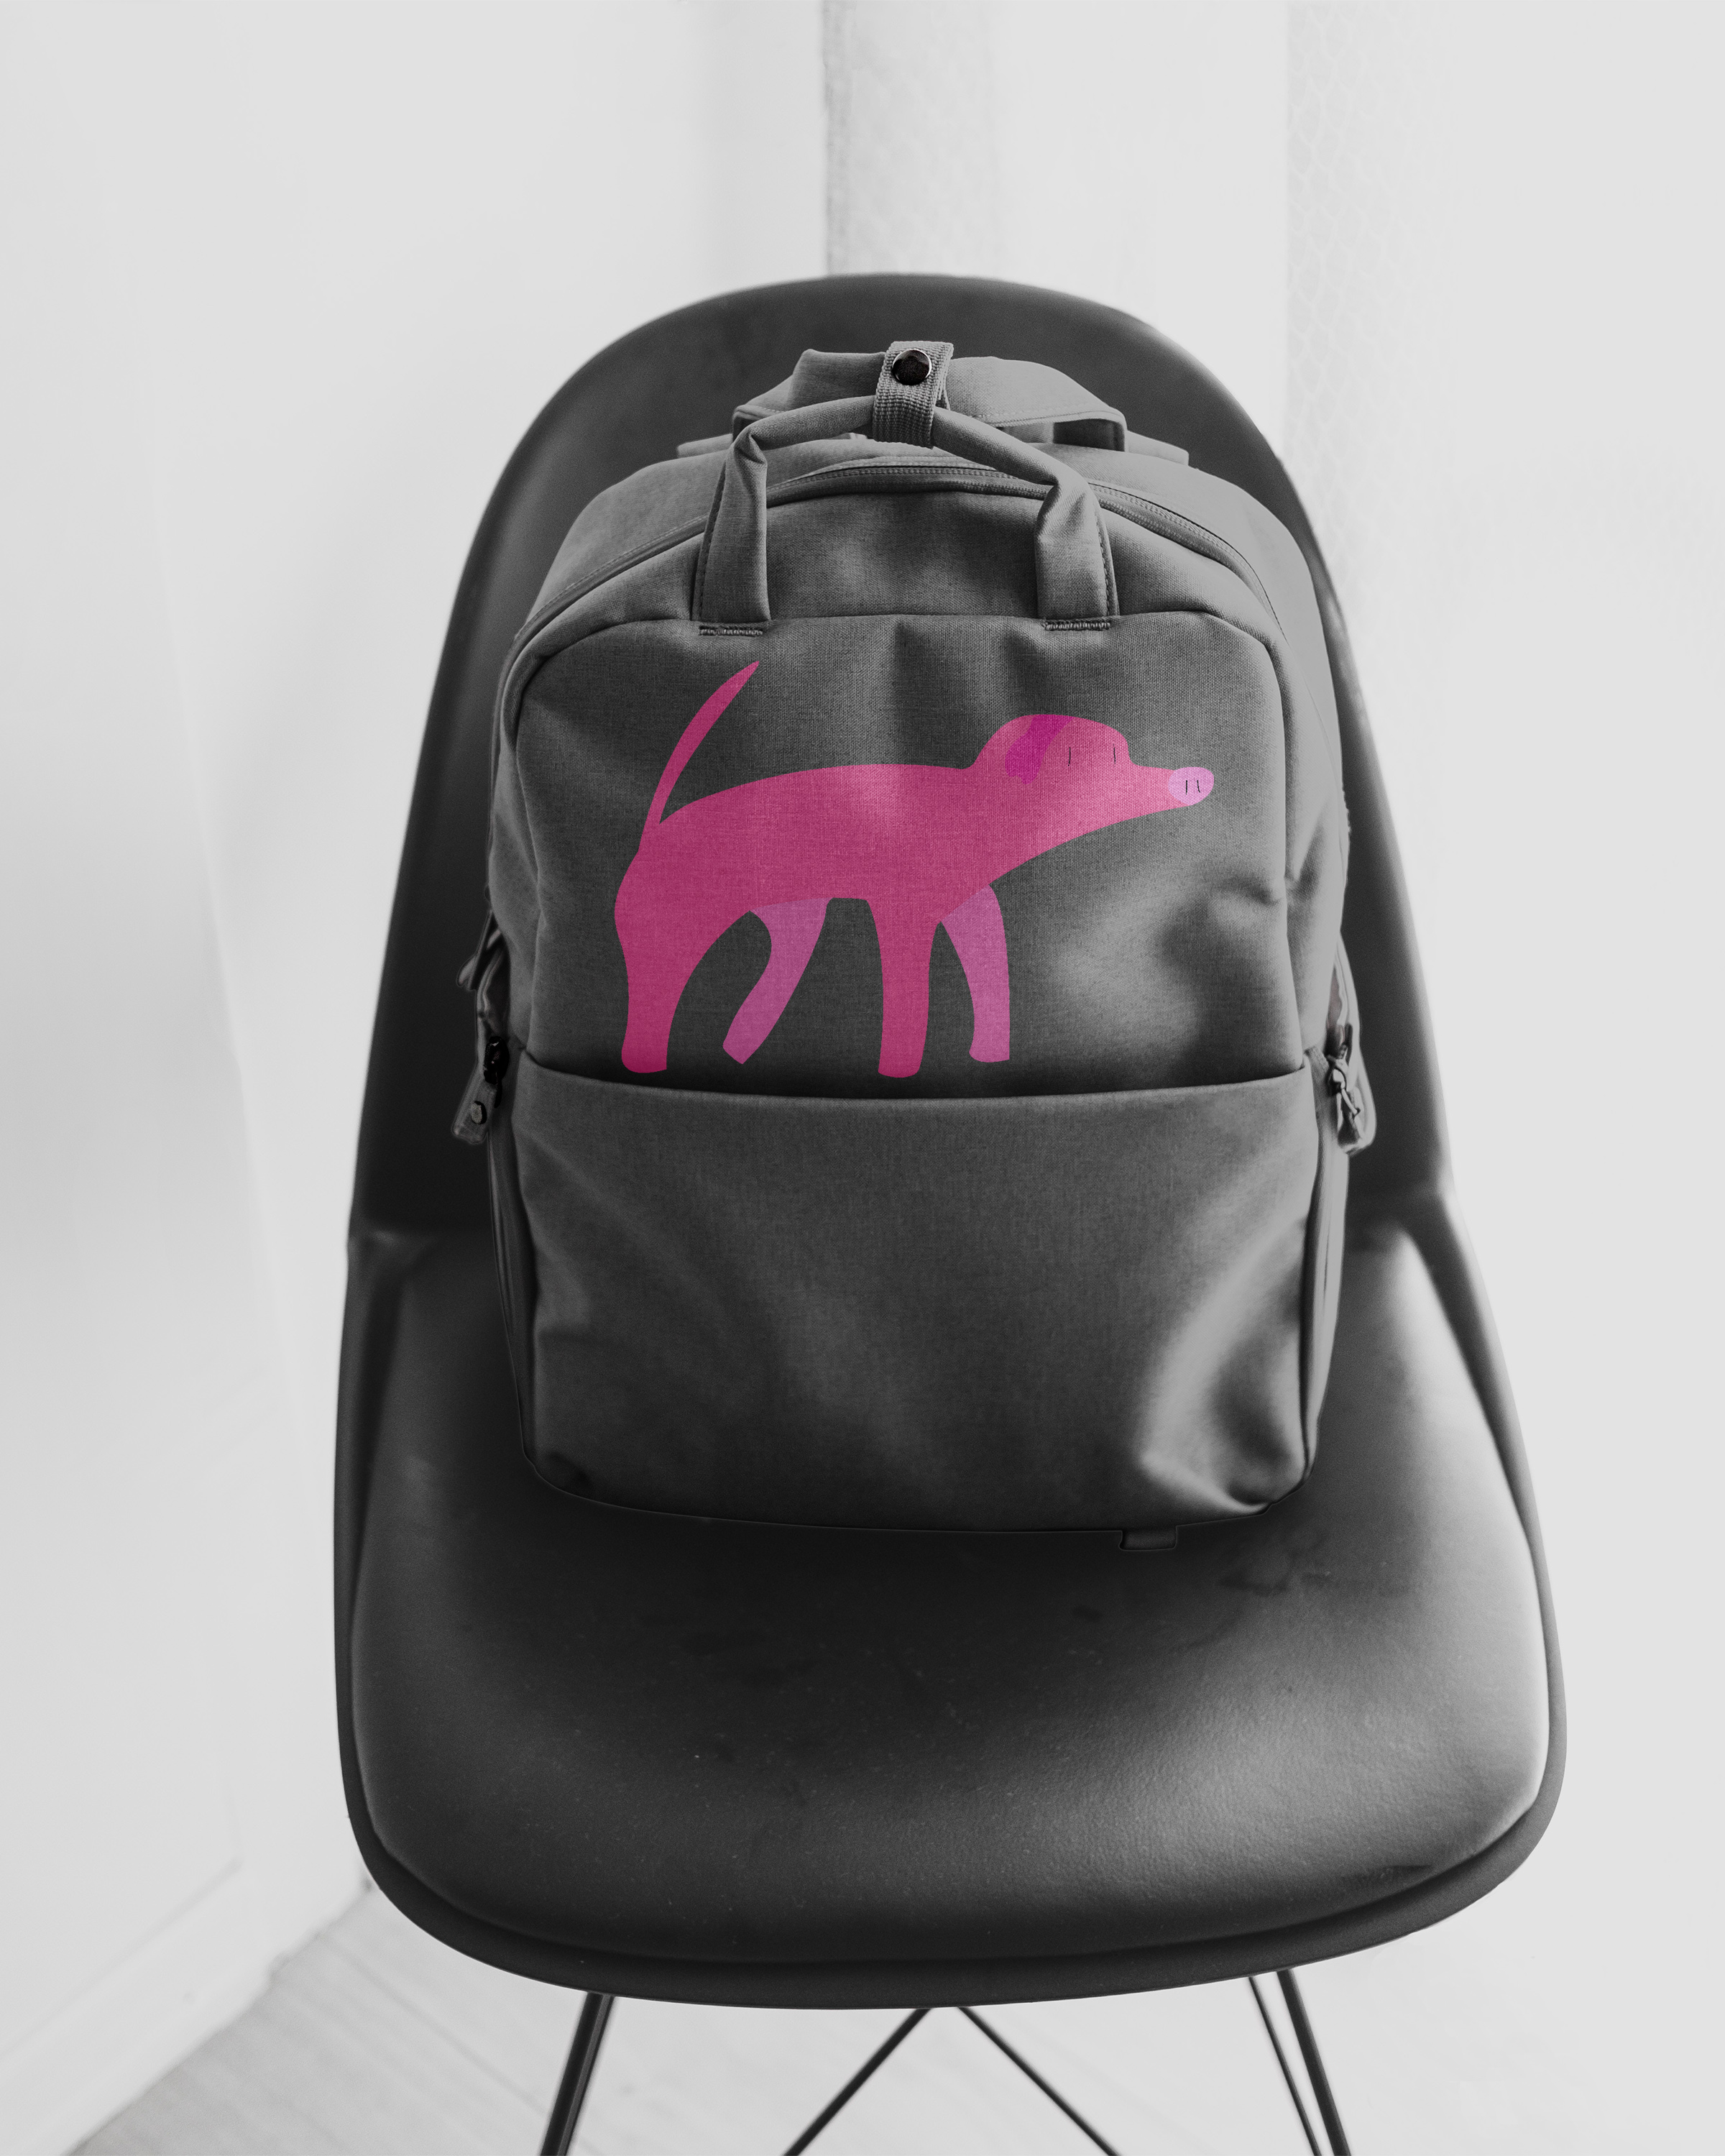 Конкурс на создание оригинального принта для рюкзаков фото f_6385f8dfb4f5c48e.jpg